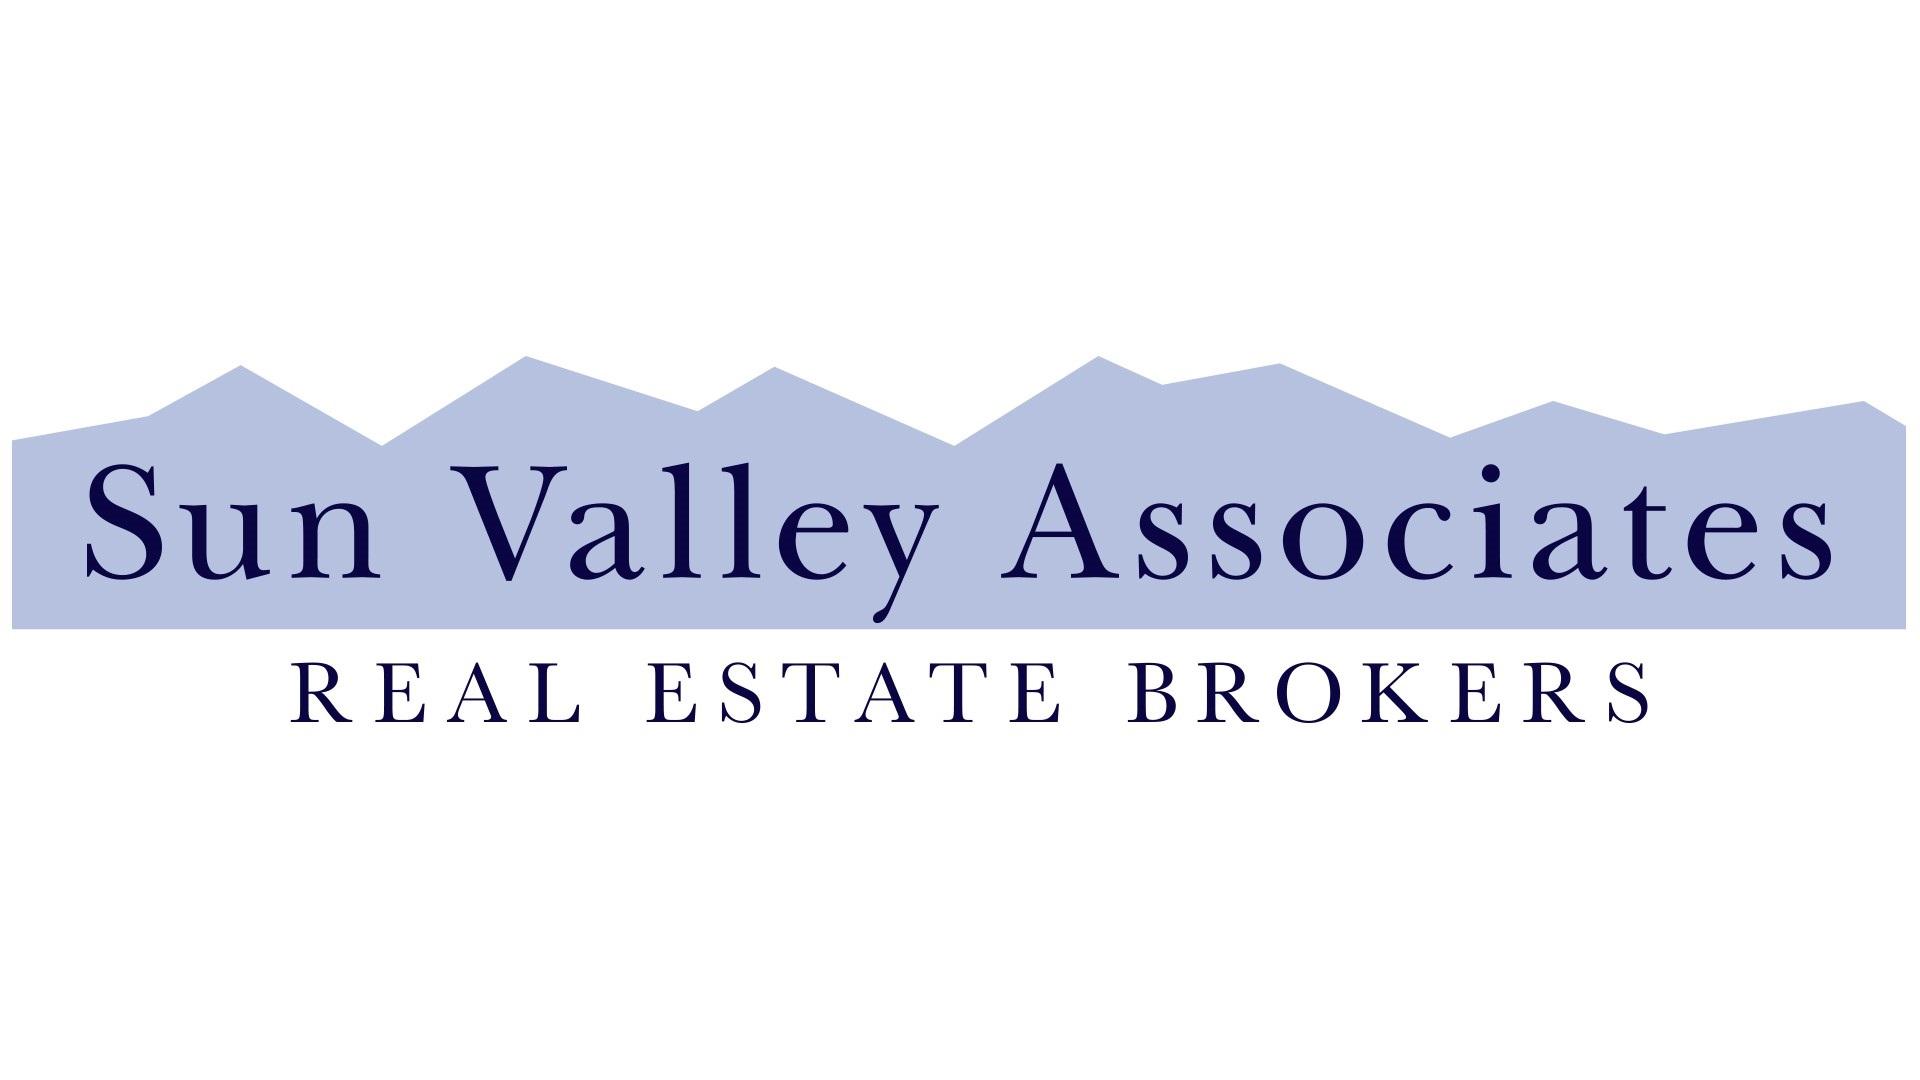 Sun Valley Associates